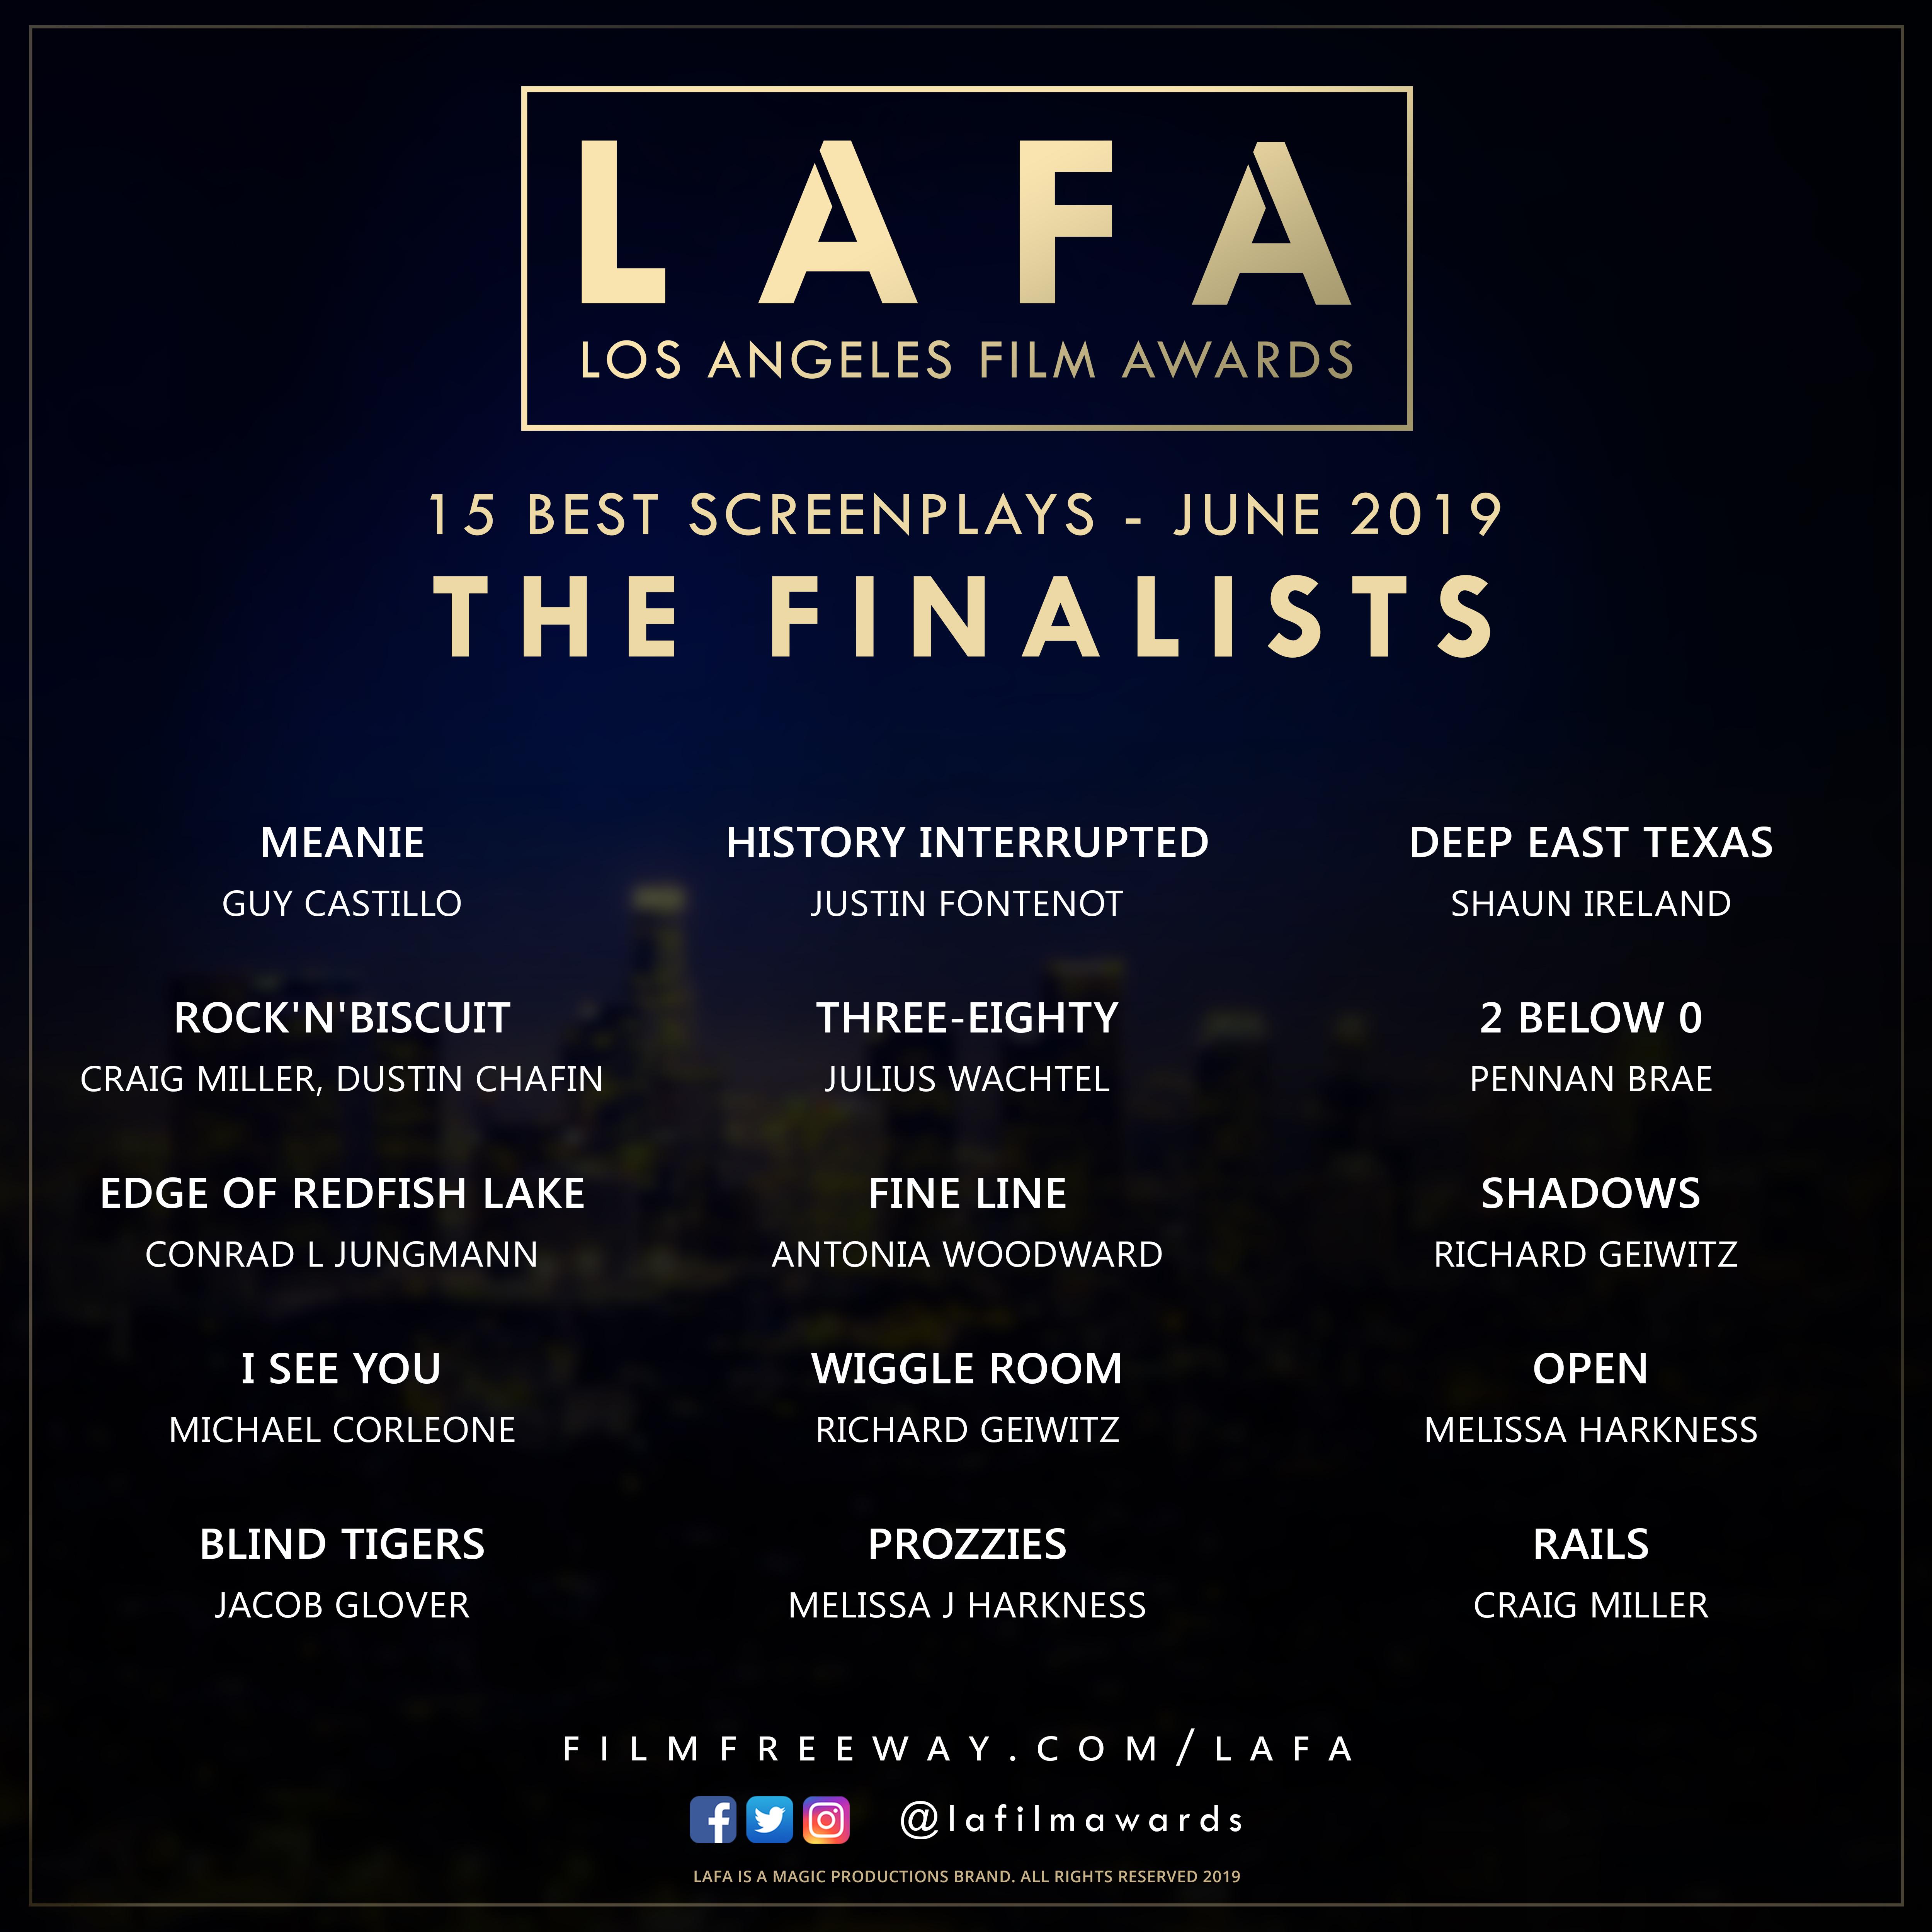 LAFA SCREENPLAY FINALISTS 2019 0